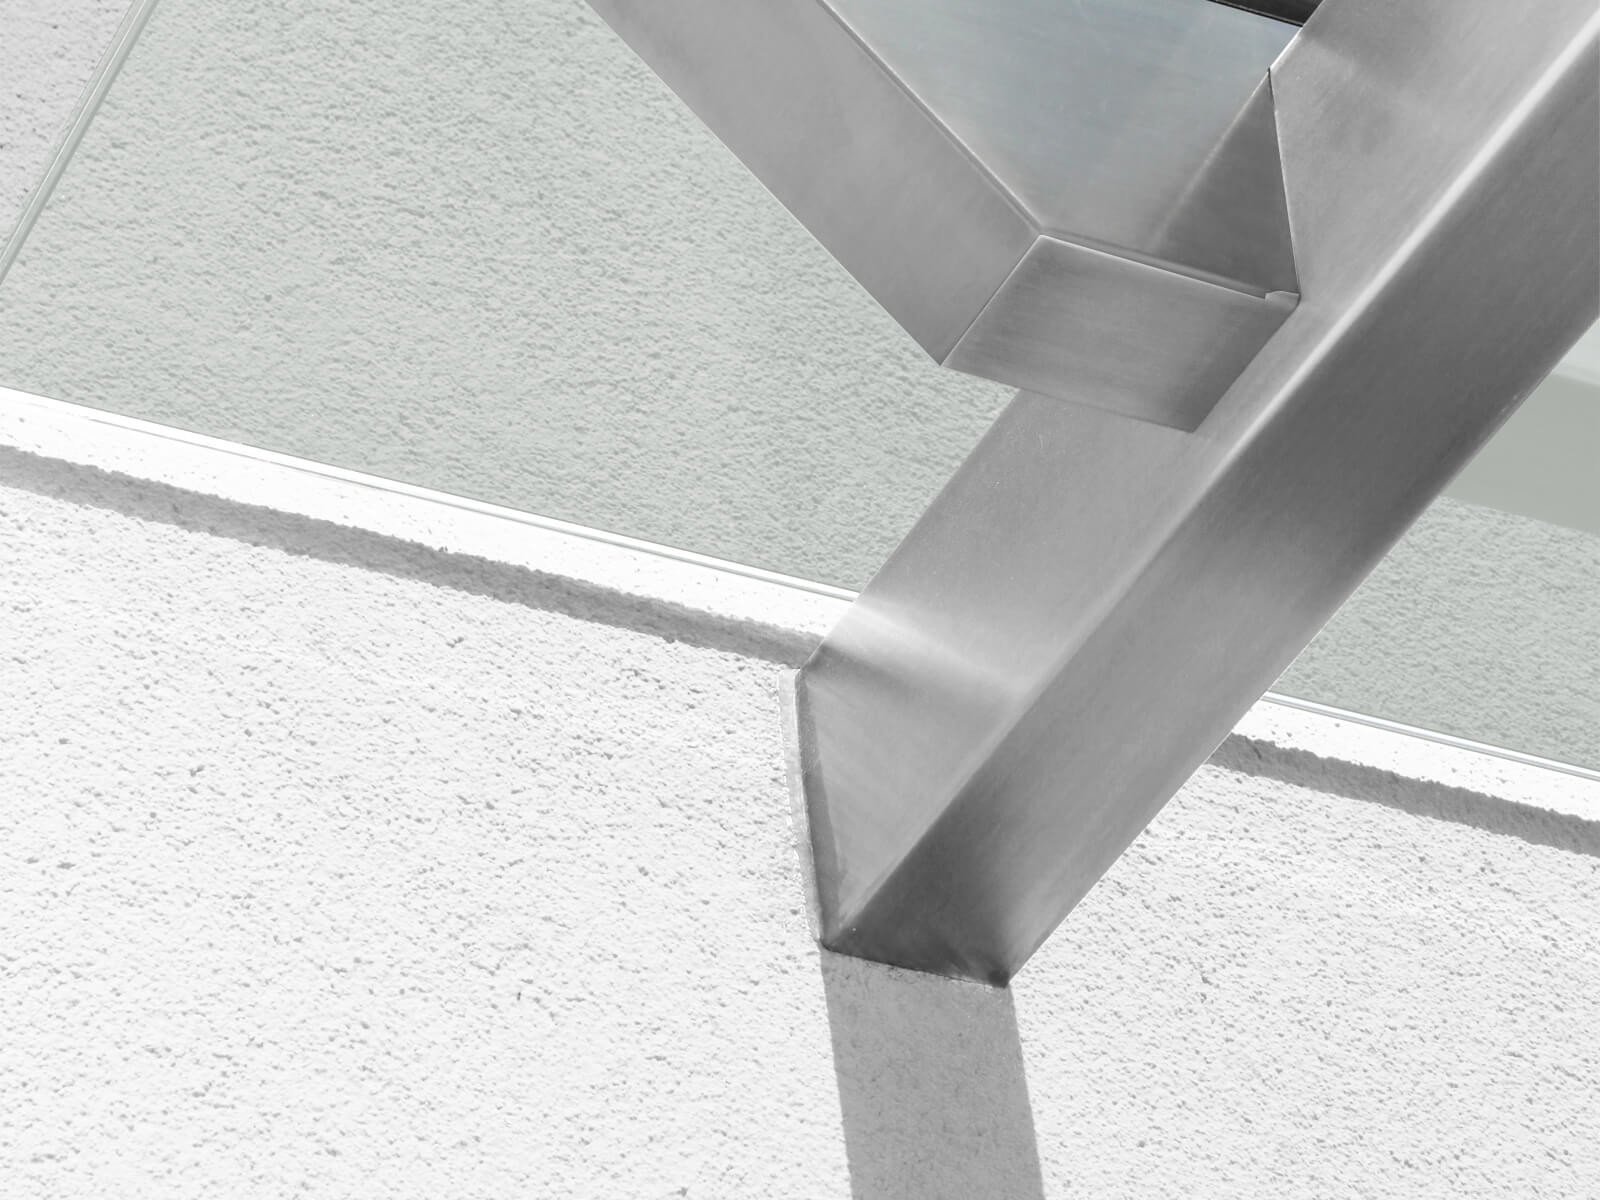 befestigung-glas-edelstahl-vordach-skala